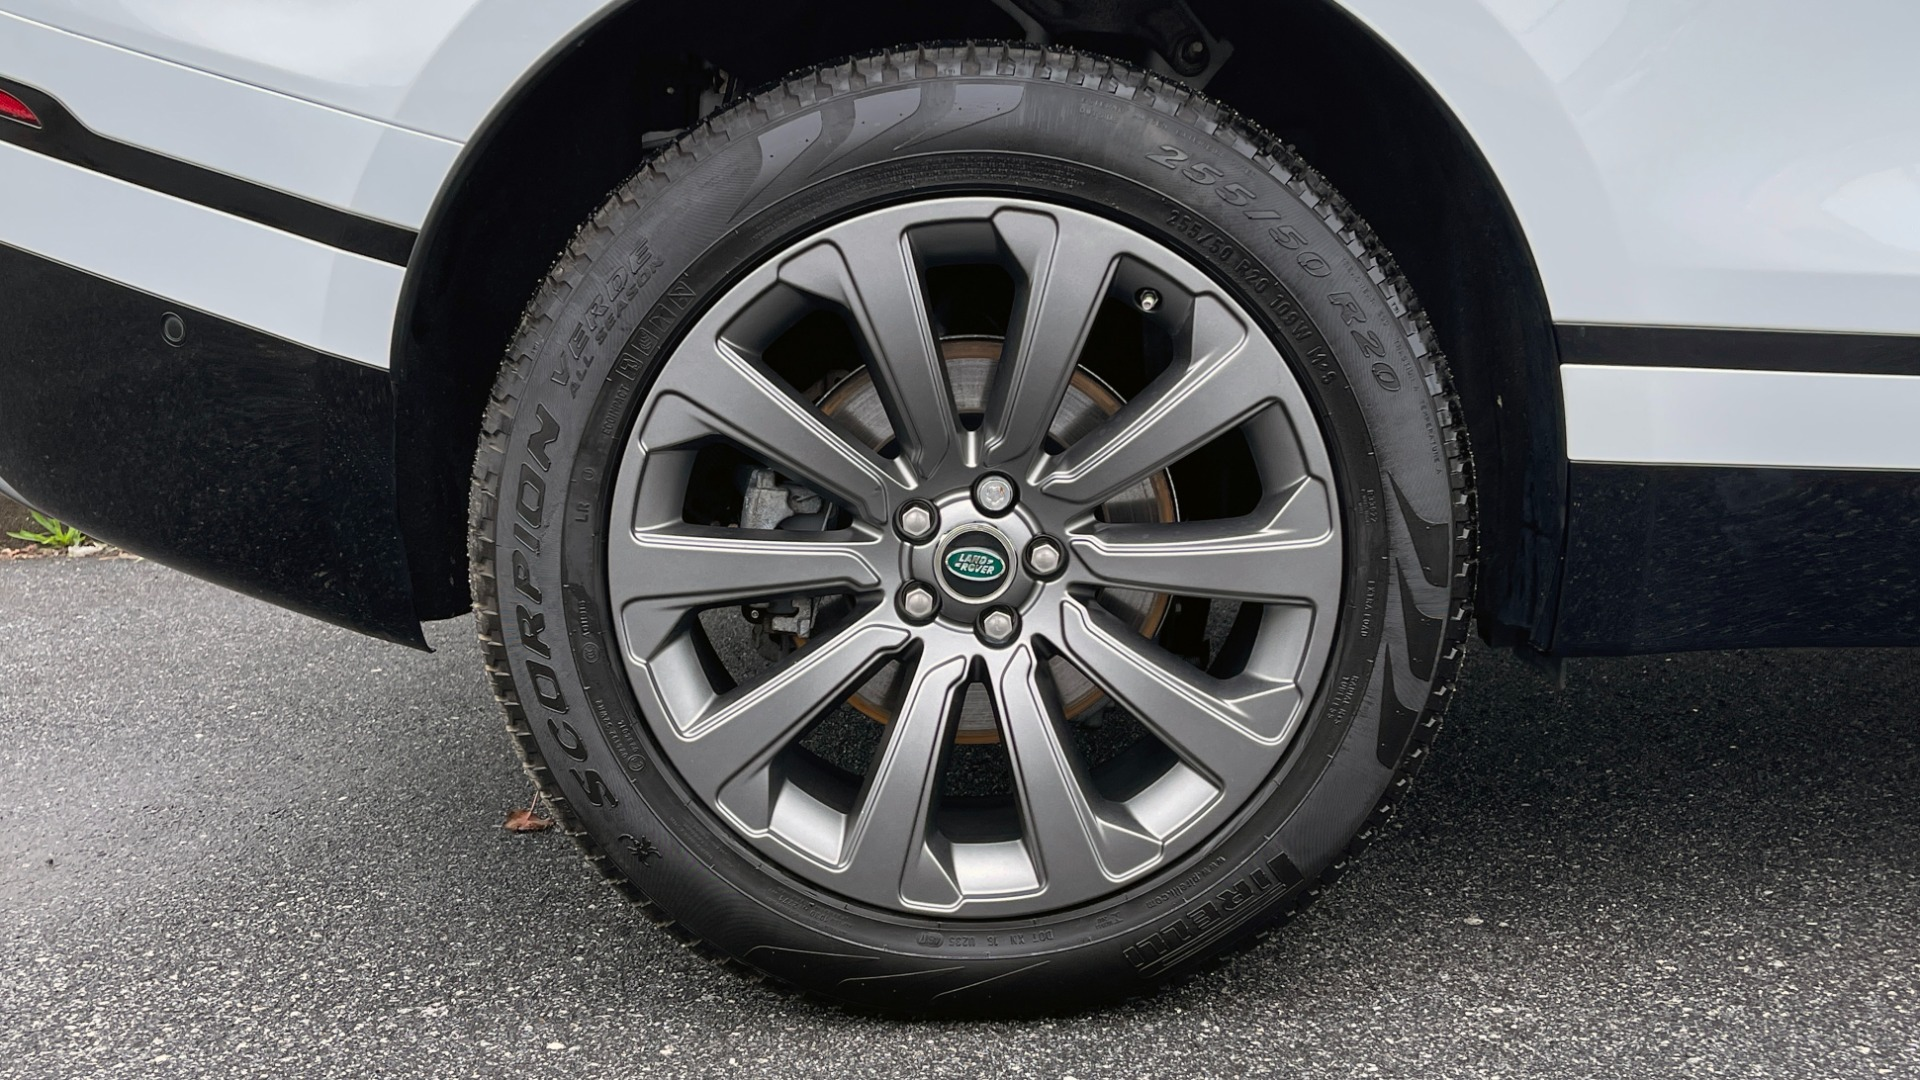 Used 2018 Land Rover RANGE ROVER VELAR R-DYNAMIC SE / NAV / PREM / MERIDIAN / SUNROOF / REARVIEW for sale $54,995 at Formula Imports in Charlotte NC 28227 68